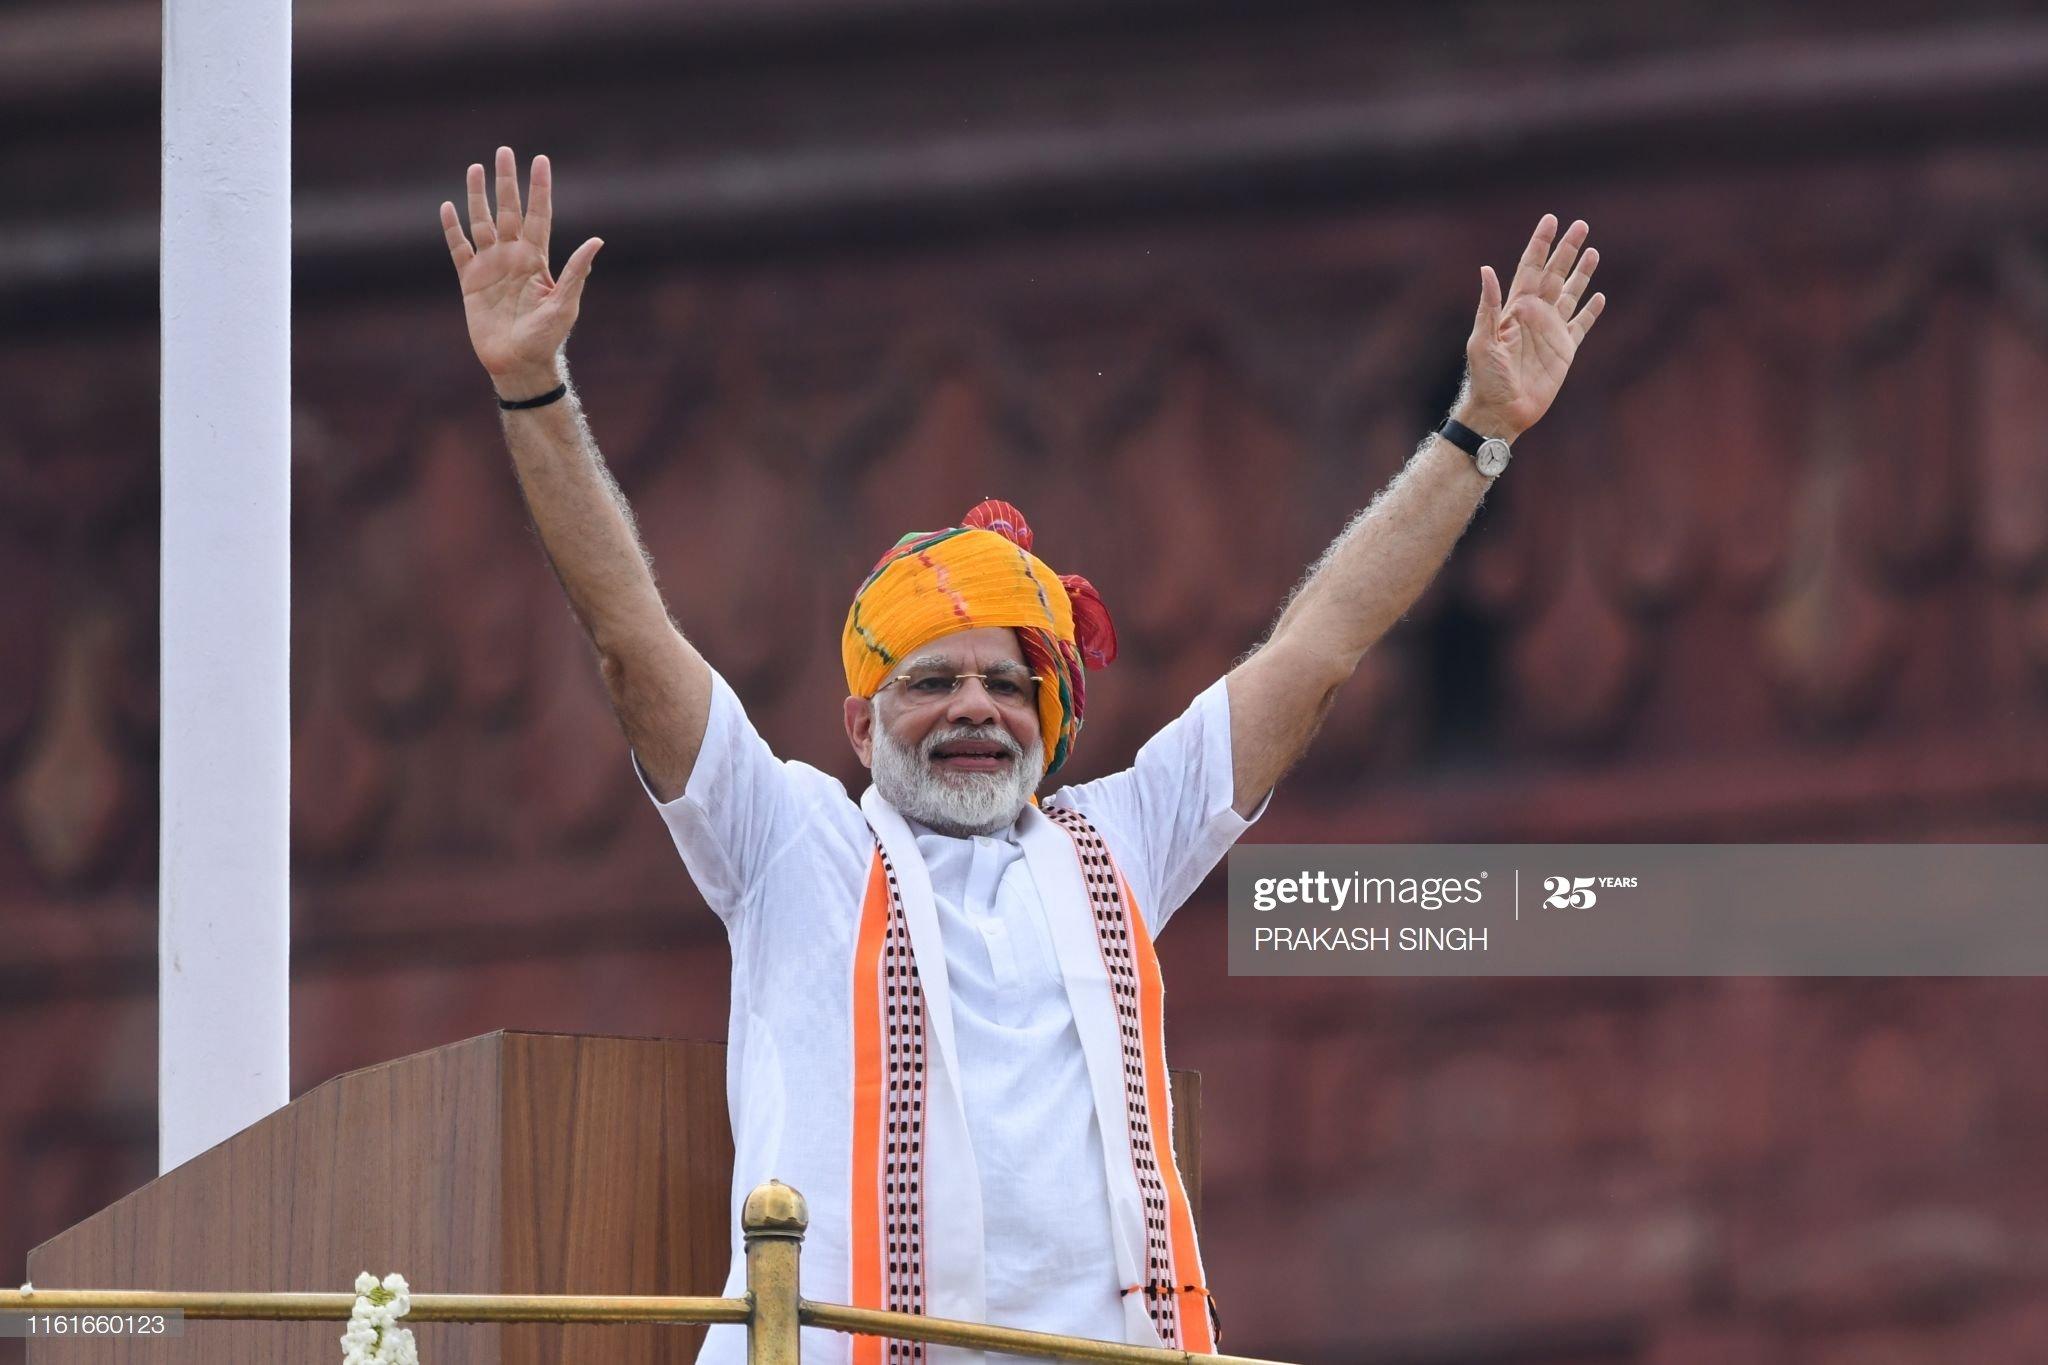 Horoscope of Narendra Modi | Prime Minister of India [Legend]